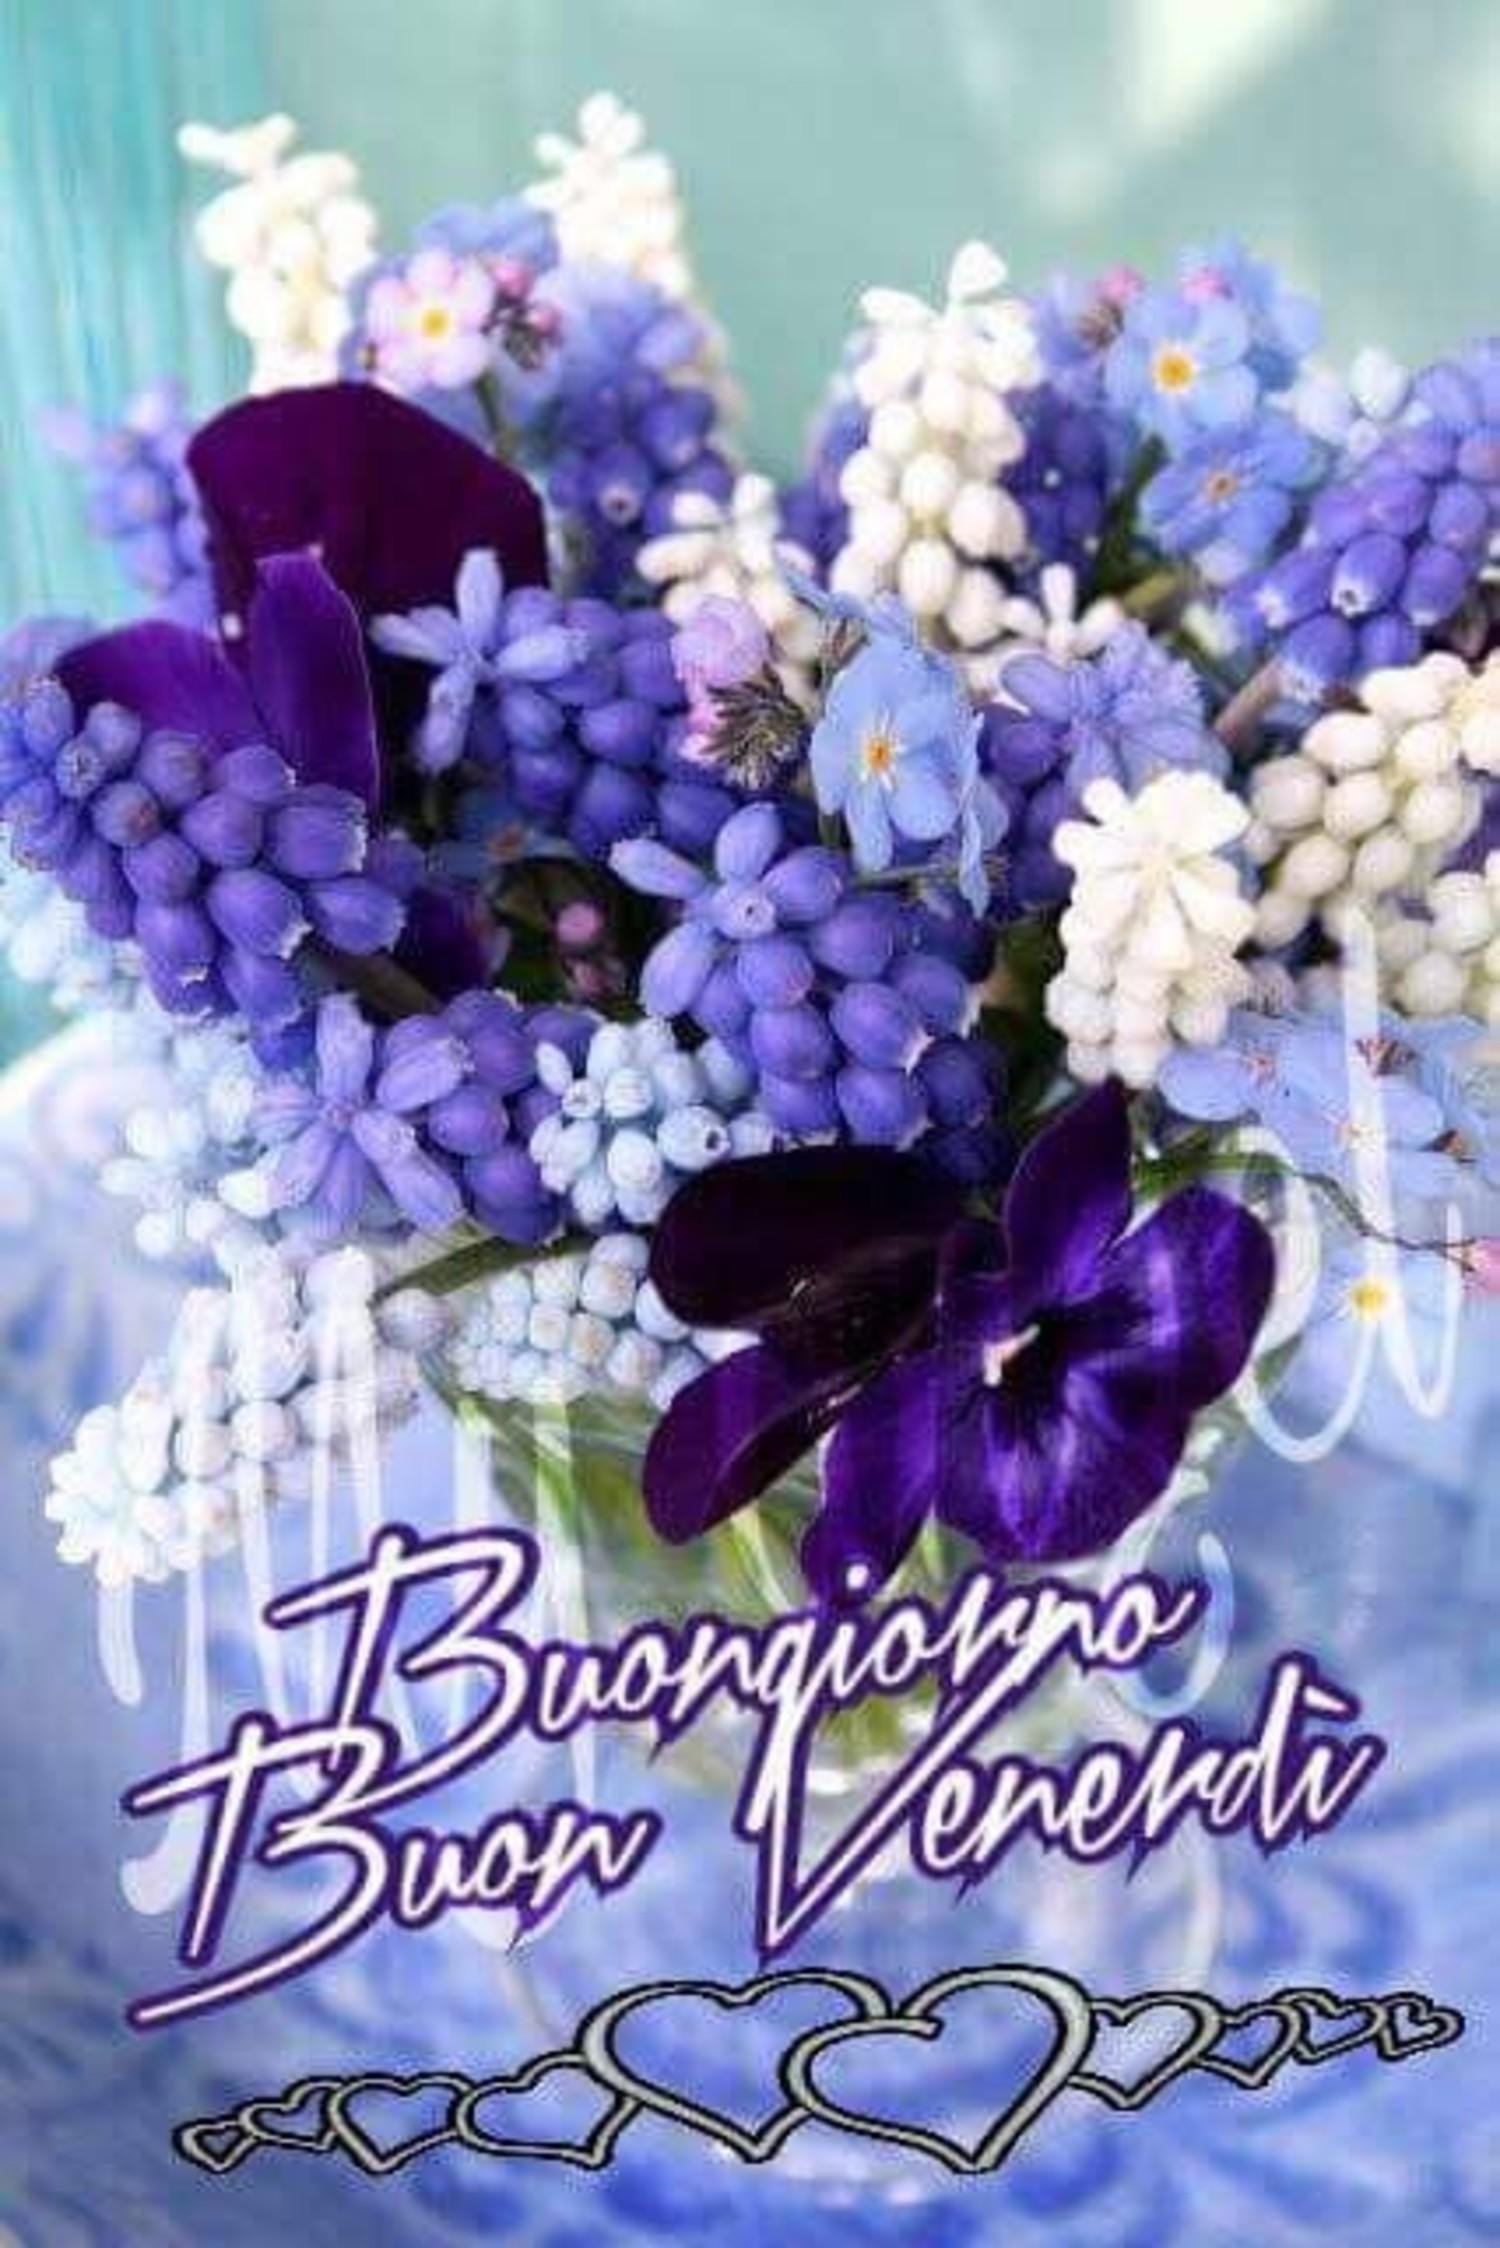 Buon Venerdì per WhatsApp 7343